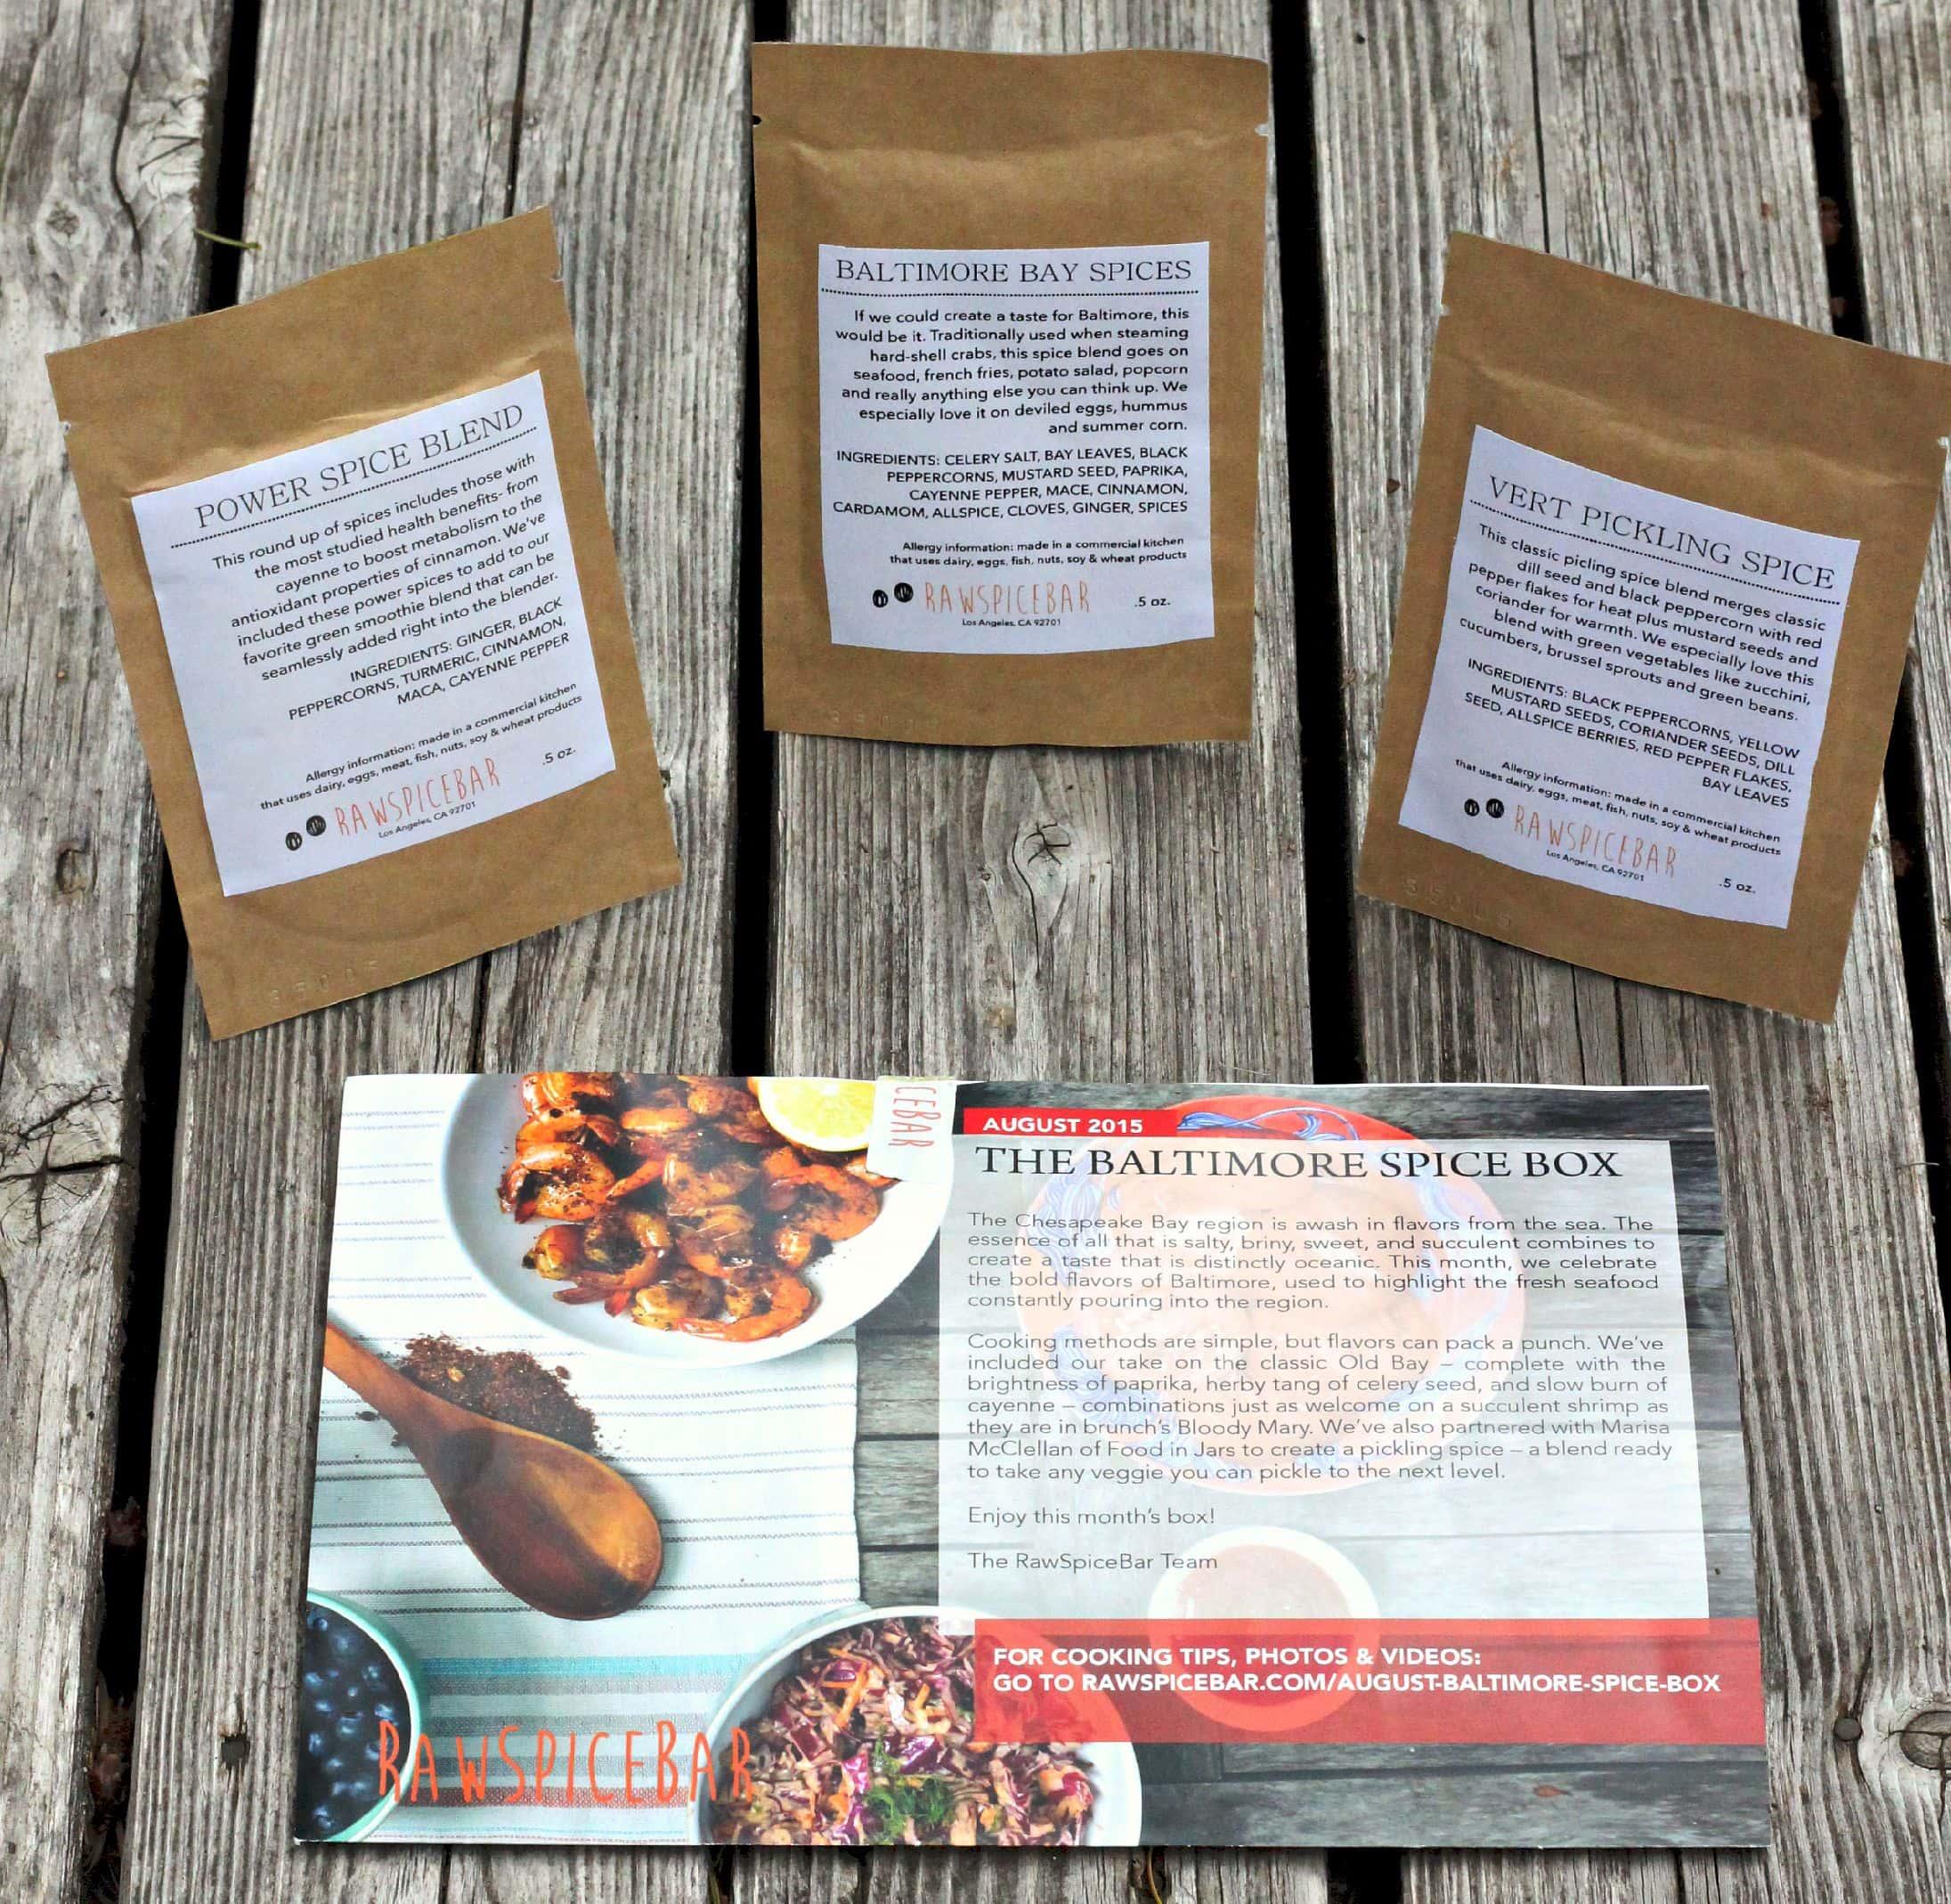 RawSpiceBar Spice Blend Packets and Recipe Info